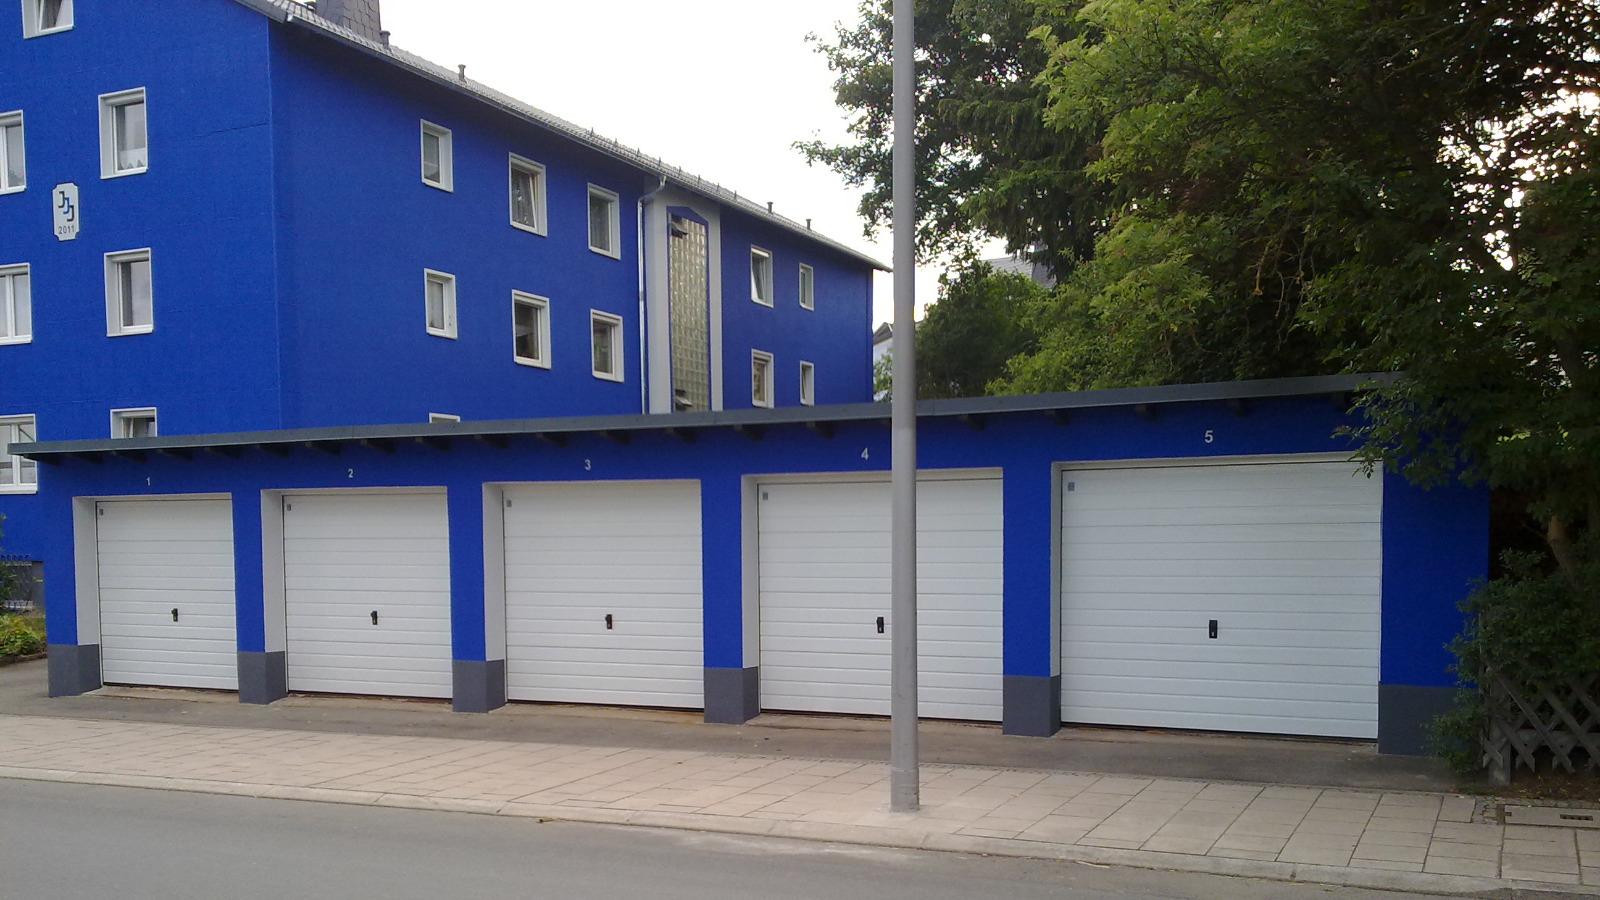 Garagenpark Hof Wunsiedler Straße 48